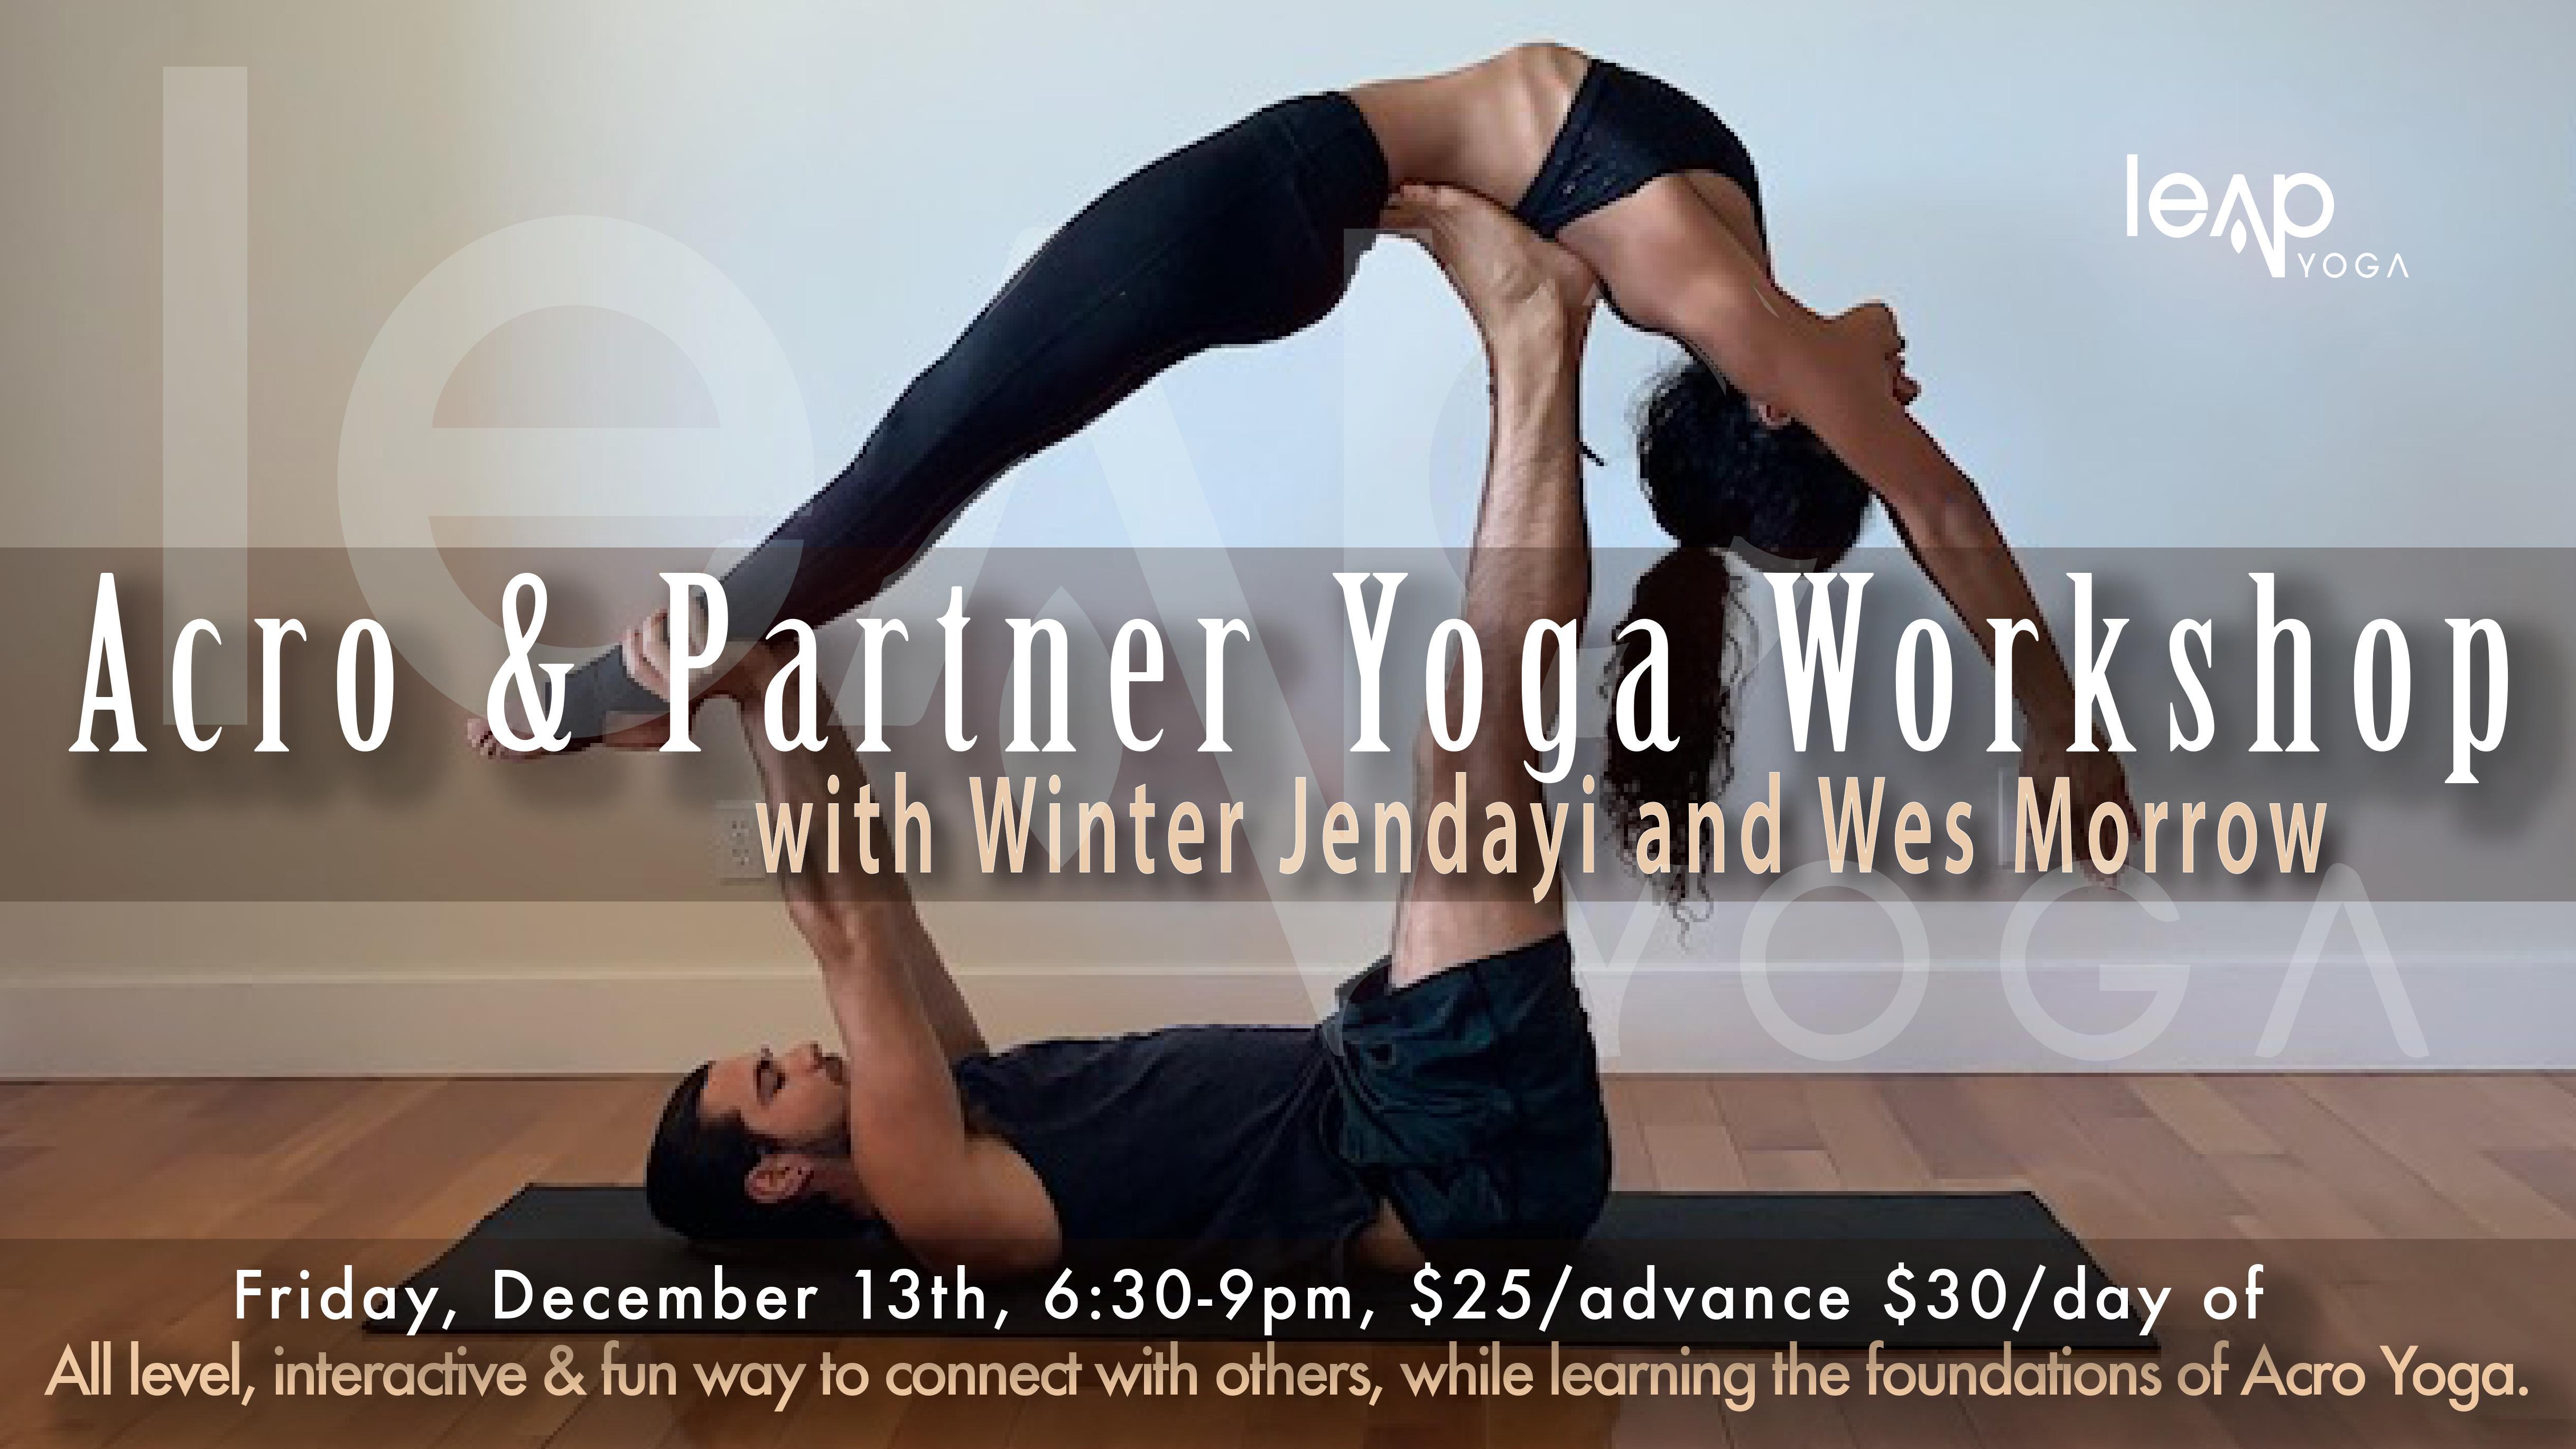 Acro Partner Yoga Workshop With Winter Jendayi And Wes Morrow Leap Yoga